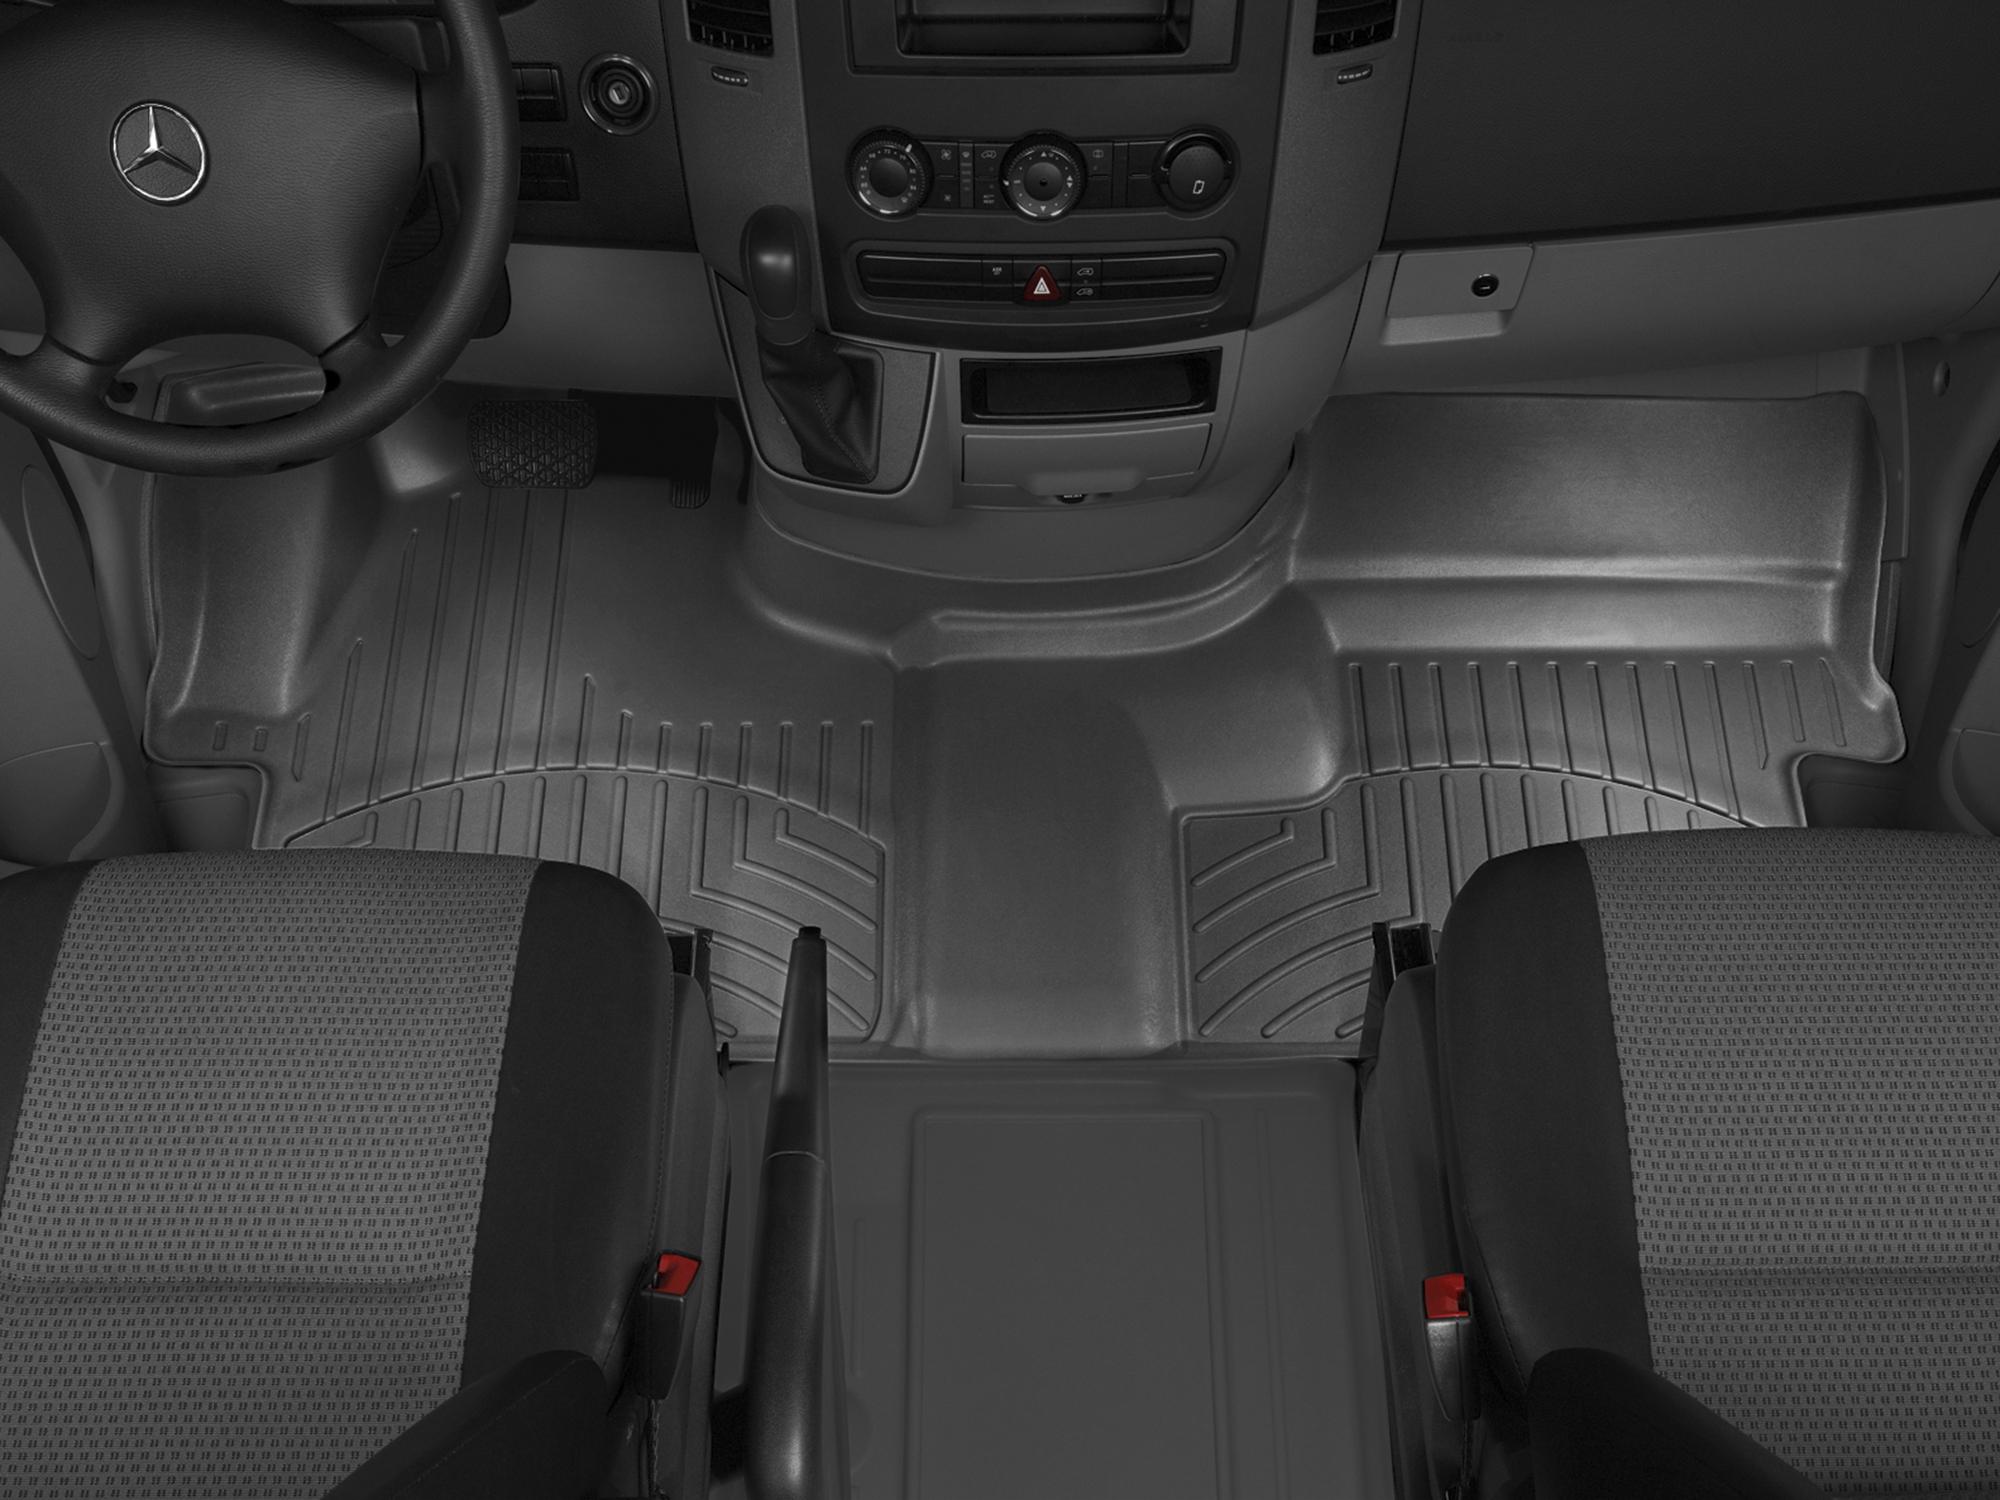 2008 Dodge Sprinter | AVM HD Floor Mats - Heavy Duty